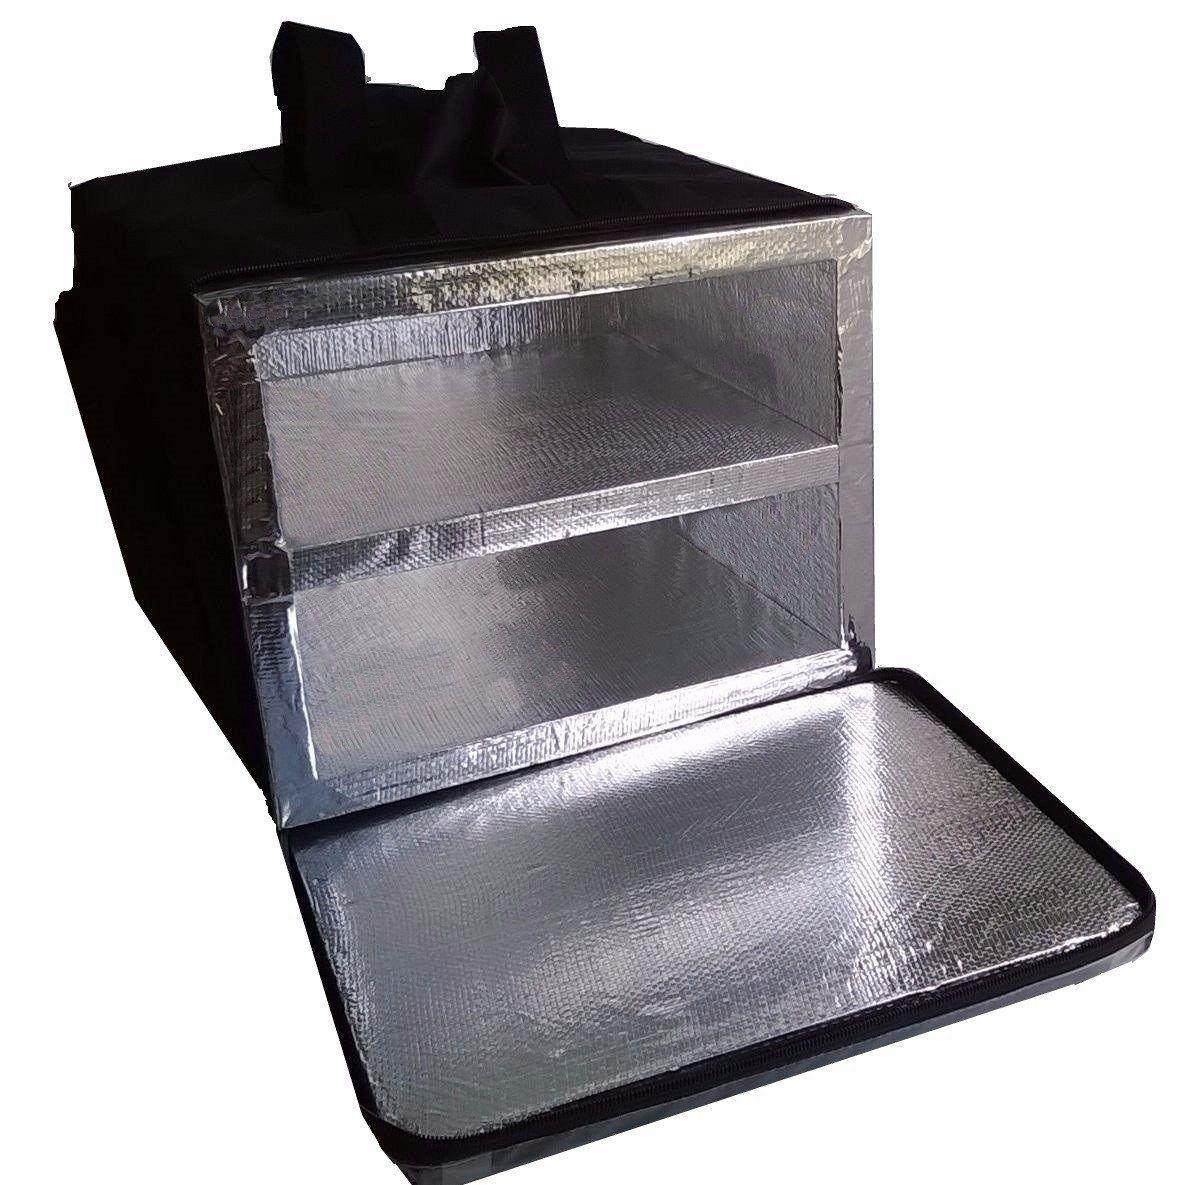 Bolsa Mochila Pizza Lanches 2 Divisórias Alumínio 53cm Bpal  - GuerreiroOnline